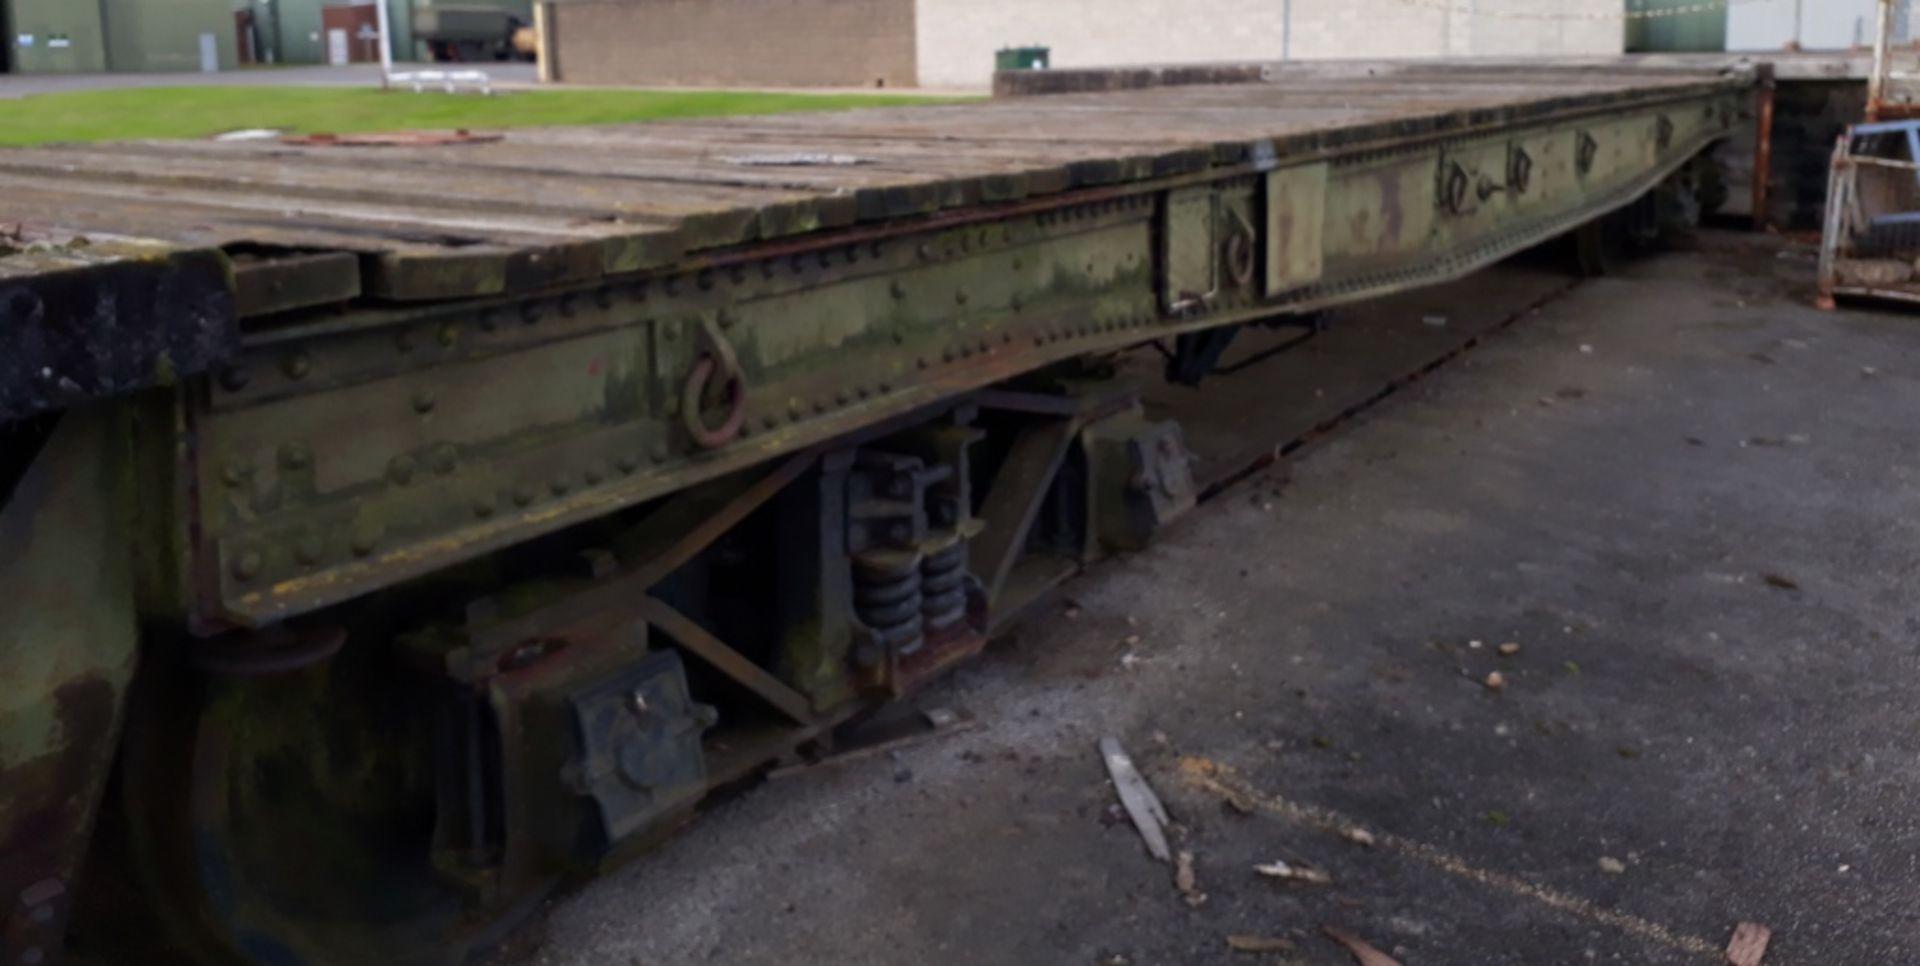 Warflat rail wagon, Built by Metropolitan – Cammell Carriage & Wagon Co Ltd Birmingham 194 - Image 4 of 13